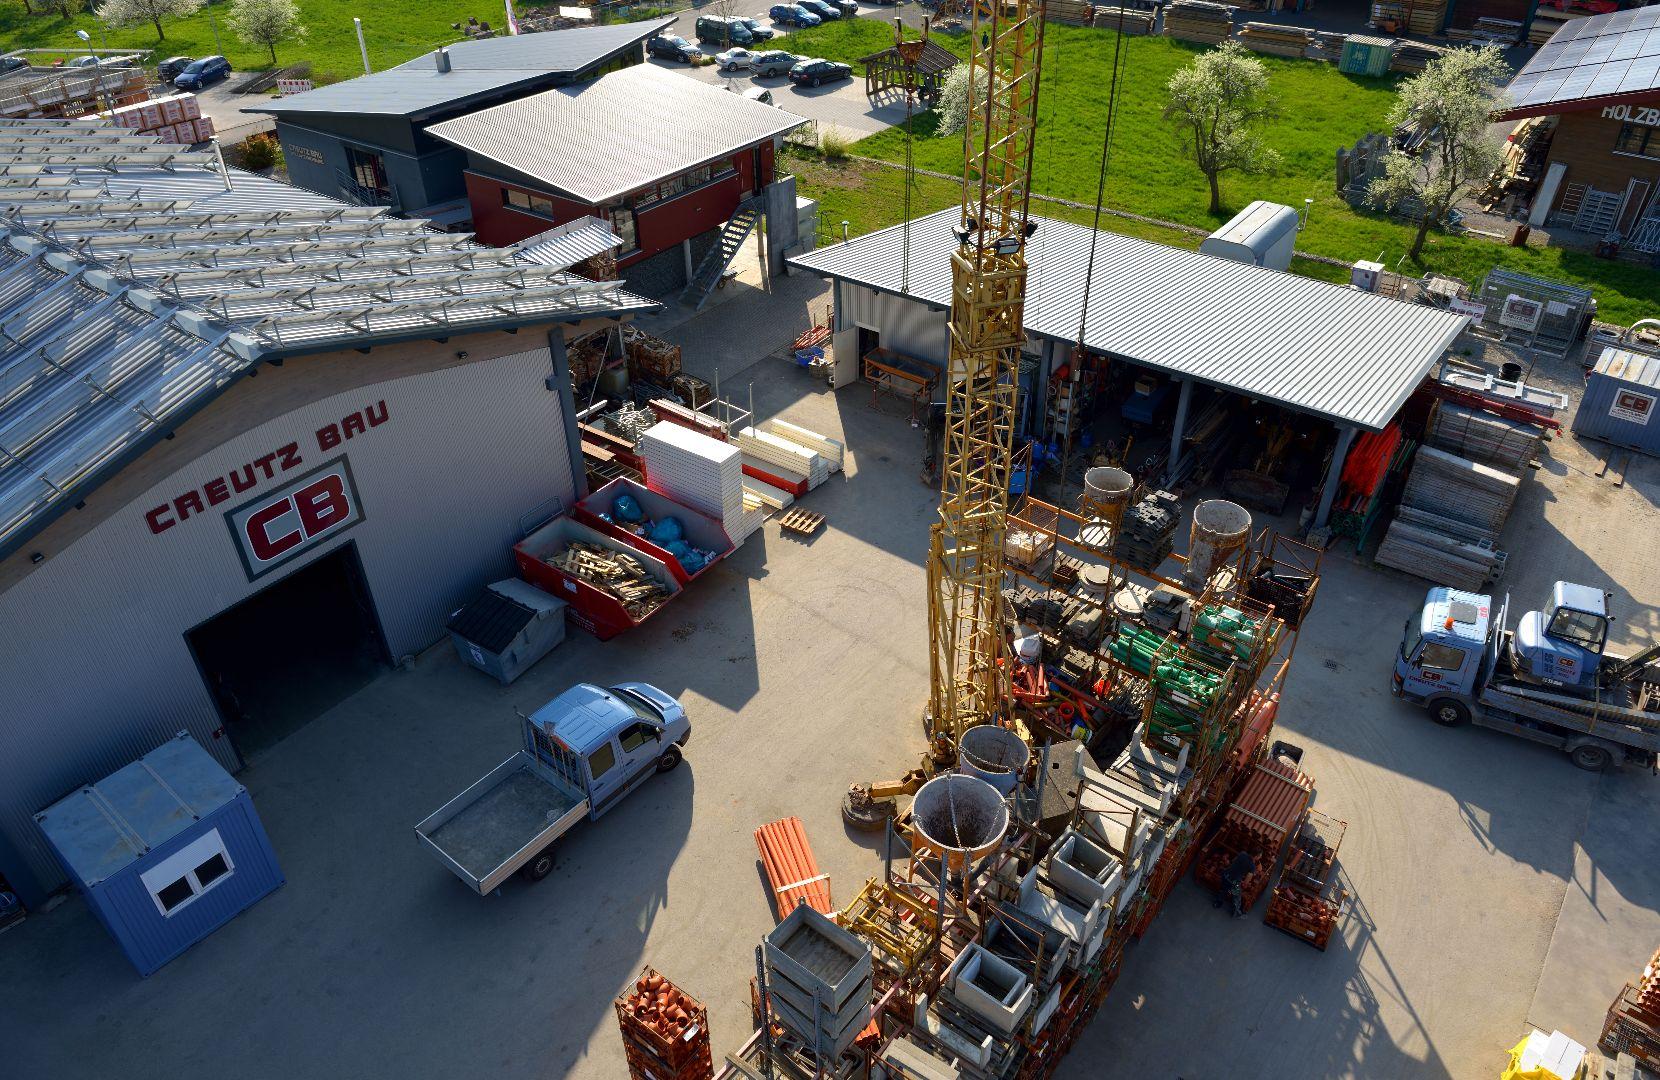 Creutz Bau, Bauunternehmen, Wildberg, Ingenieurbüro, Gartenbau